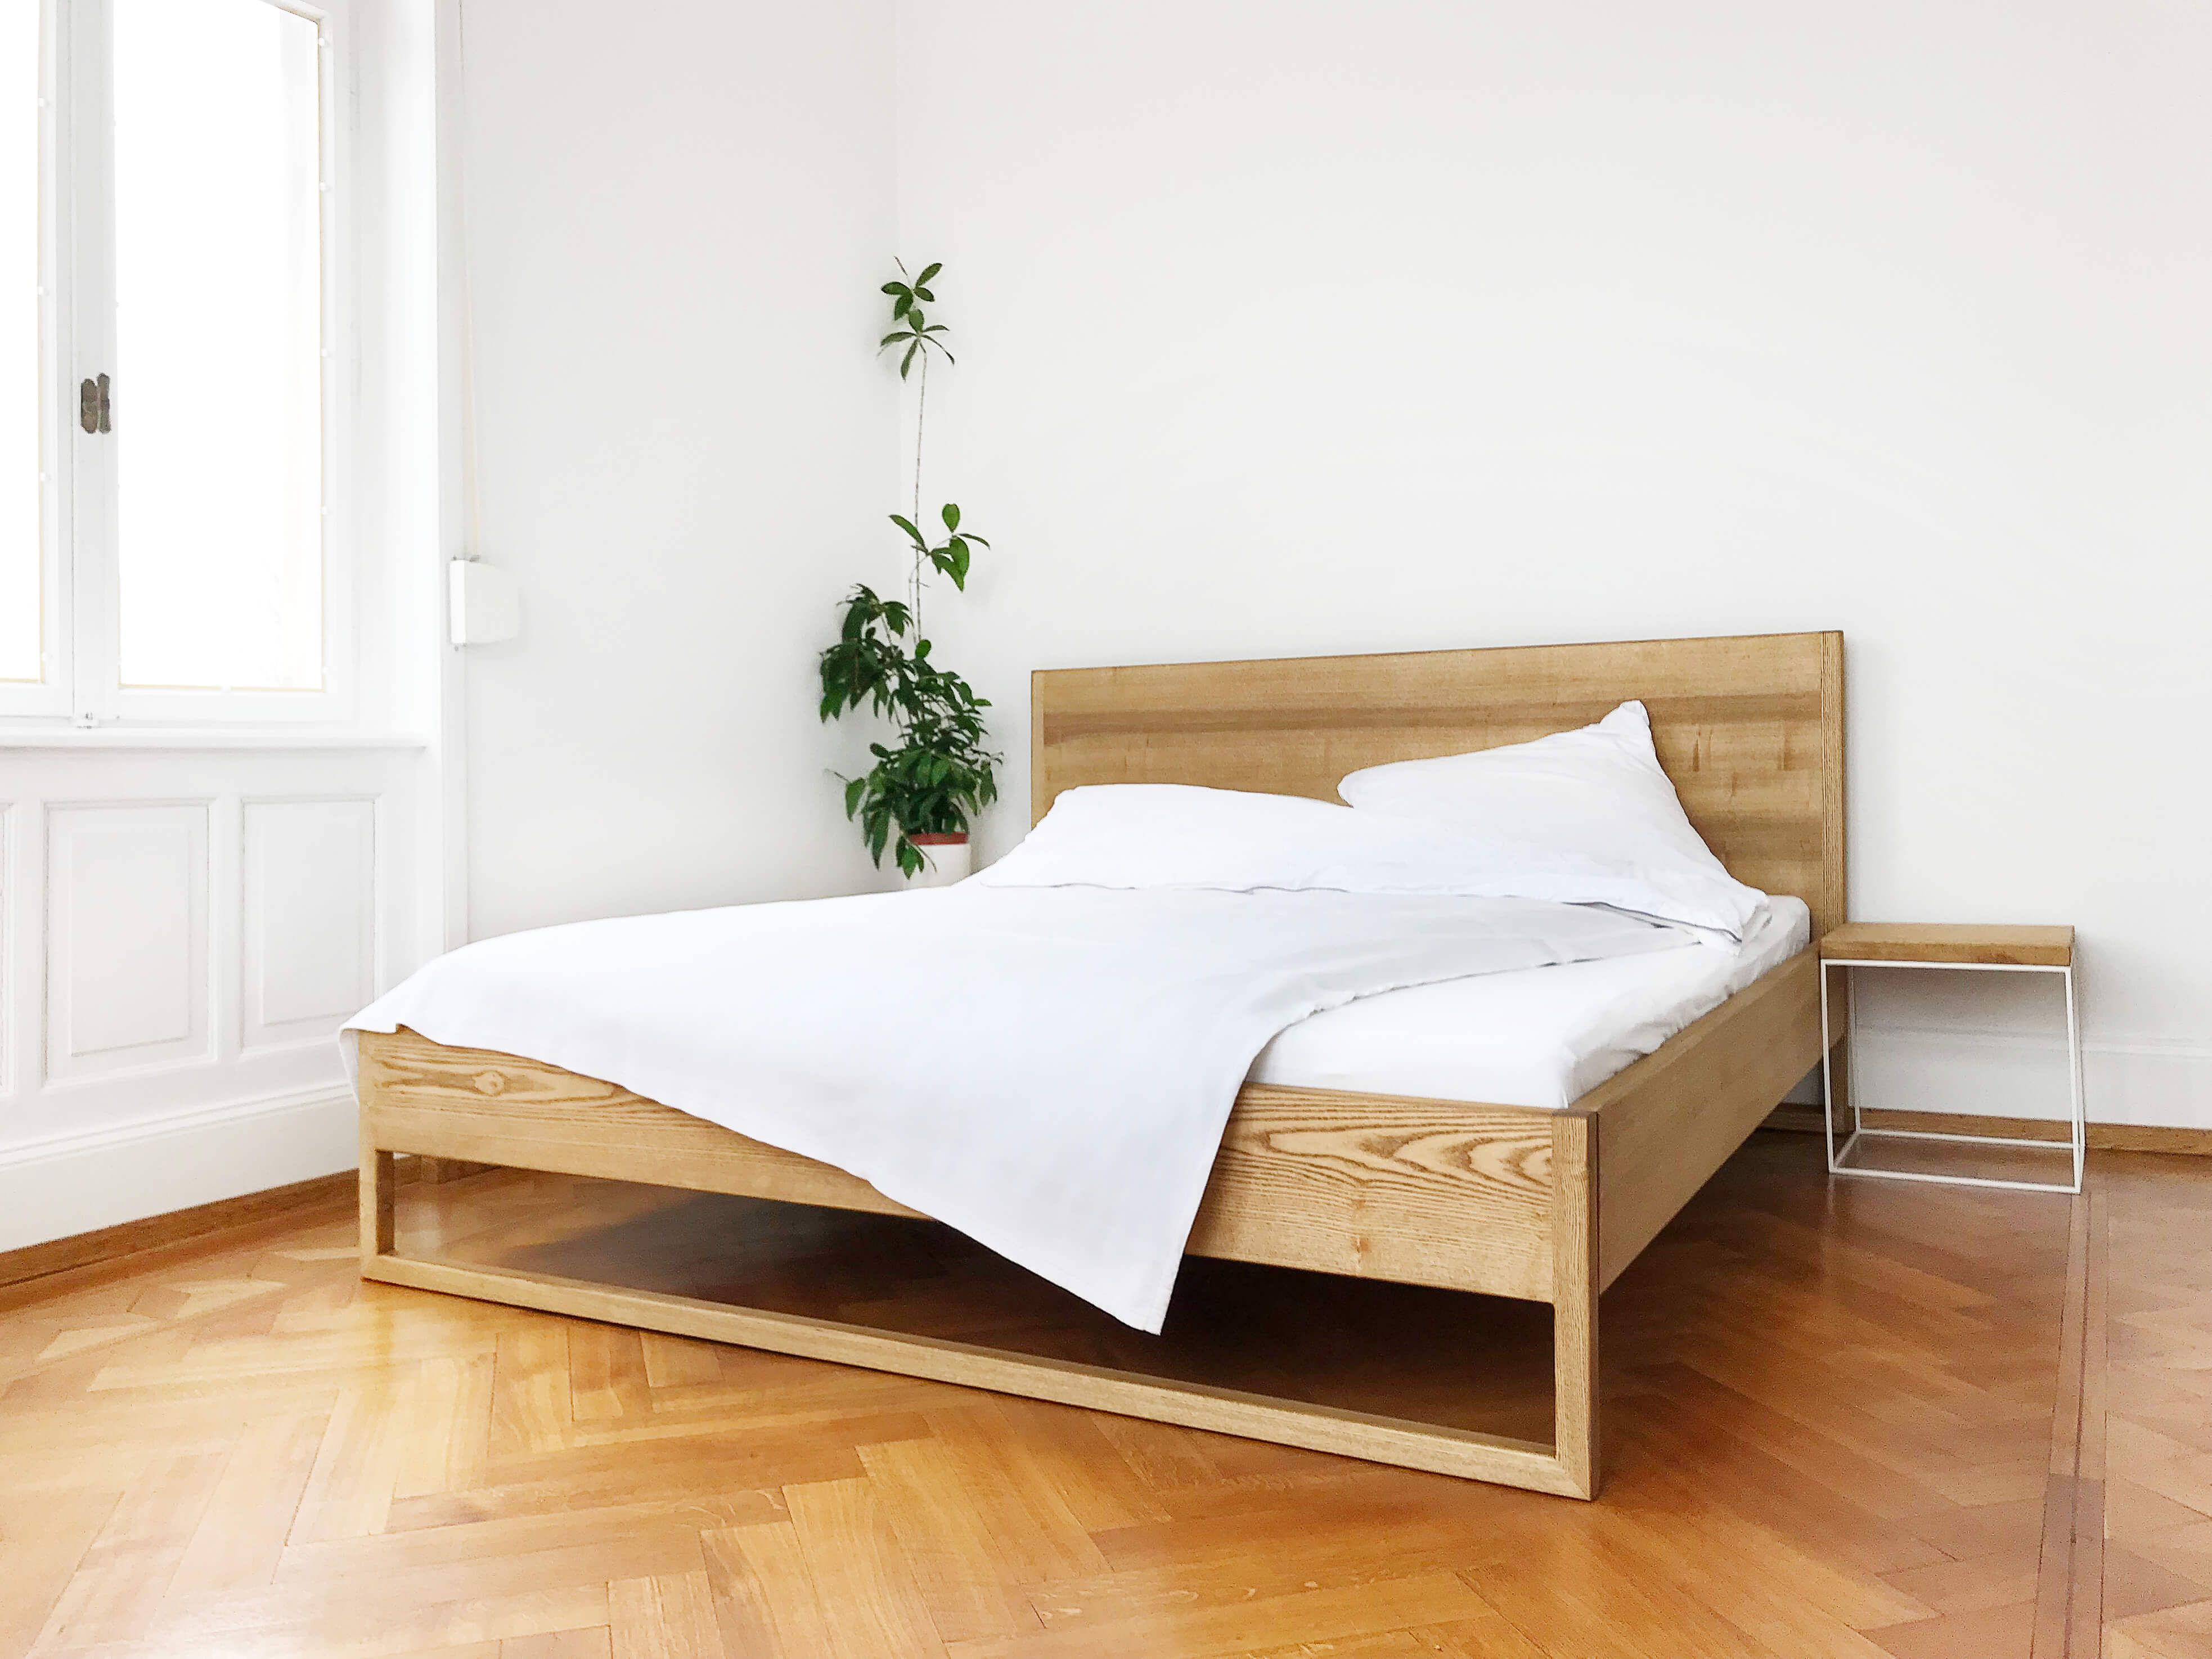 Pure Ash Bed Massivholzbett Aus Esche N51e12 Design Manufacture Massivholzbett Bett Holz Designer Bett